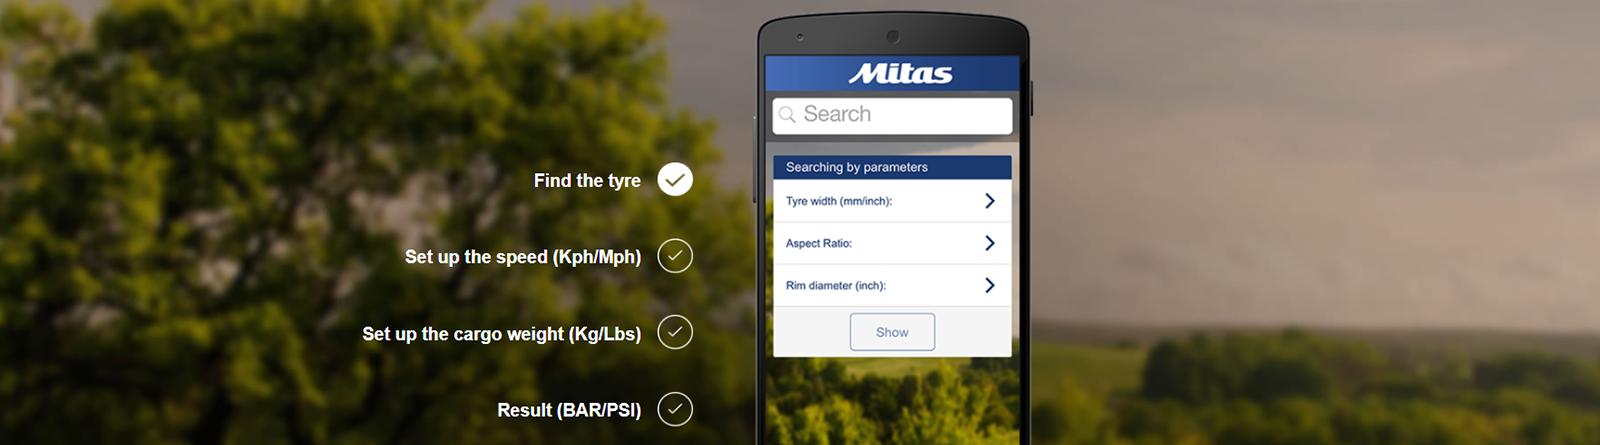 Mitas Tyre Pressure Mobile App